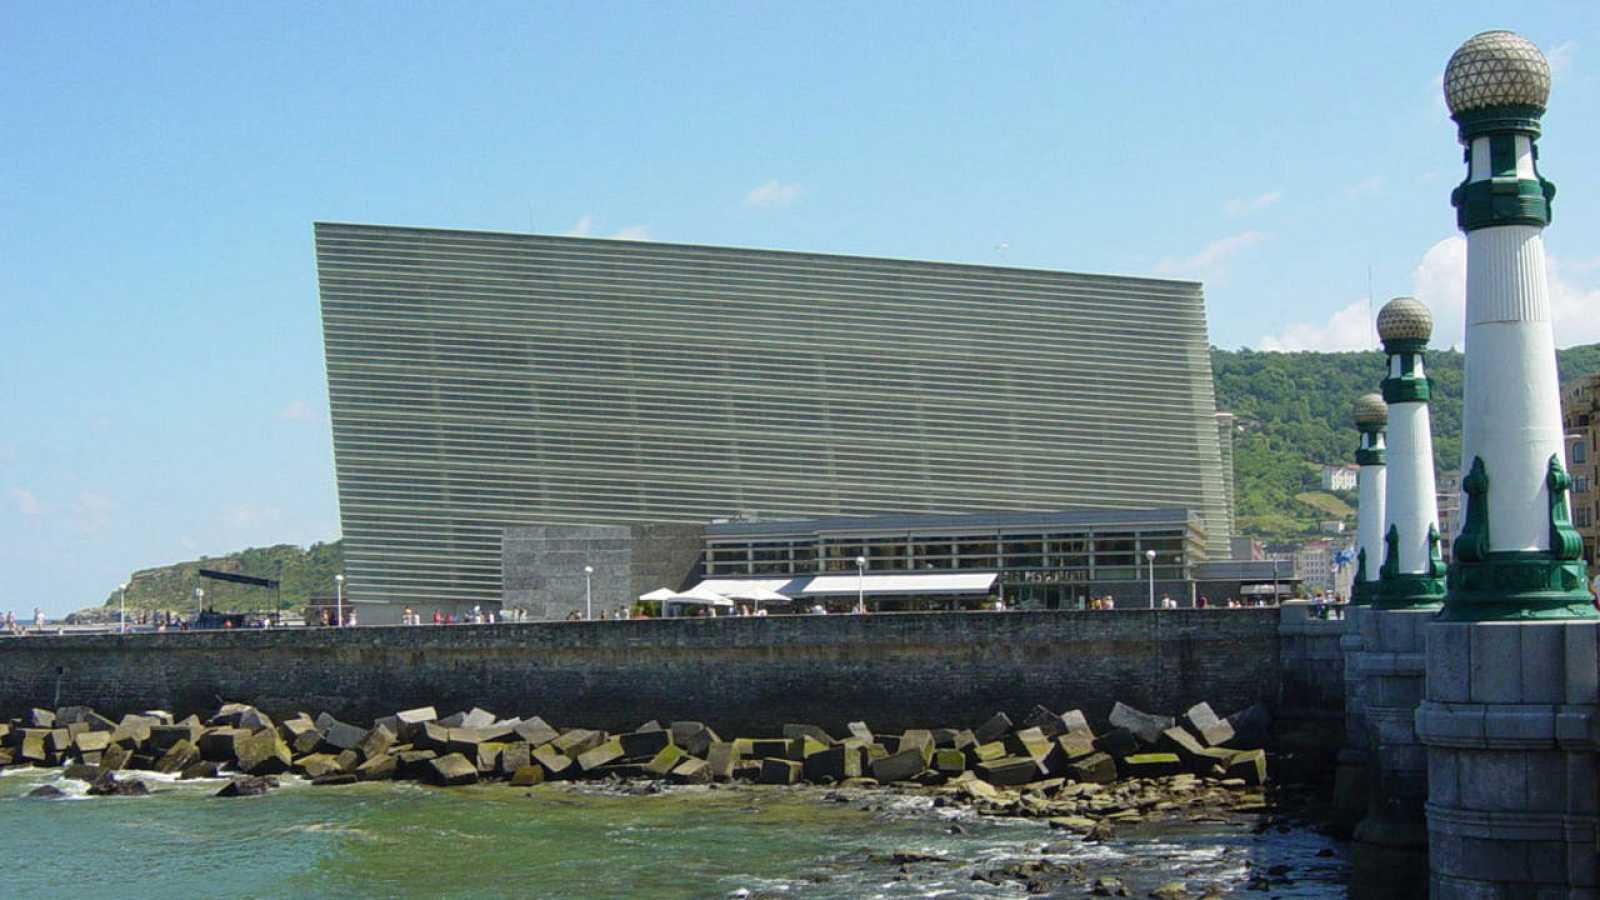 Vista del auditorio Kursaal, en San Sebastián, una obra del arquitecto Rafael Moneo.